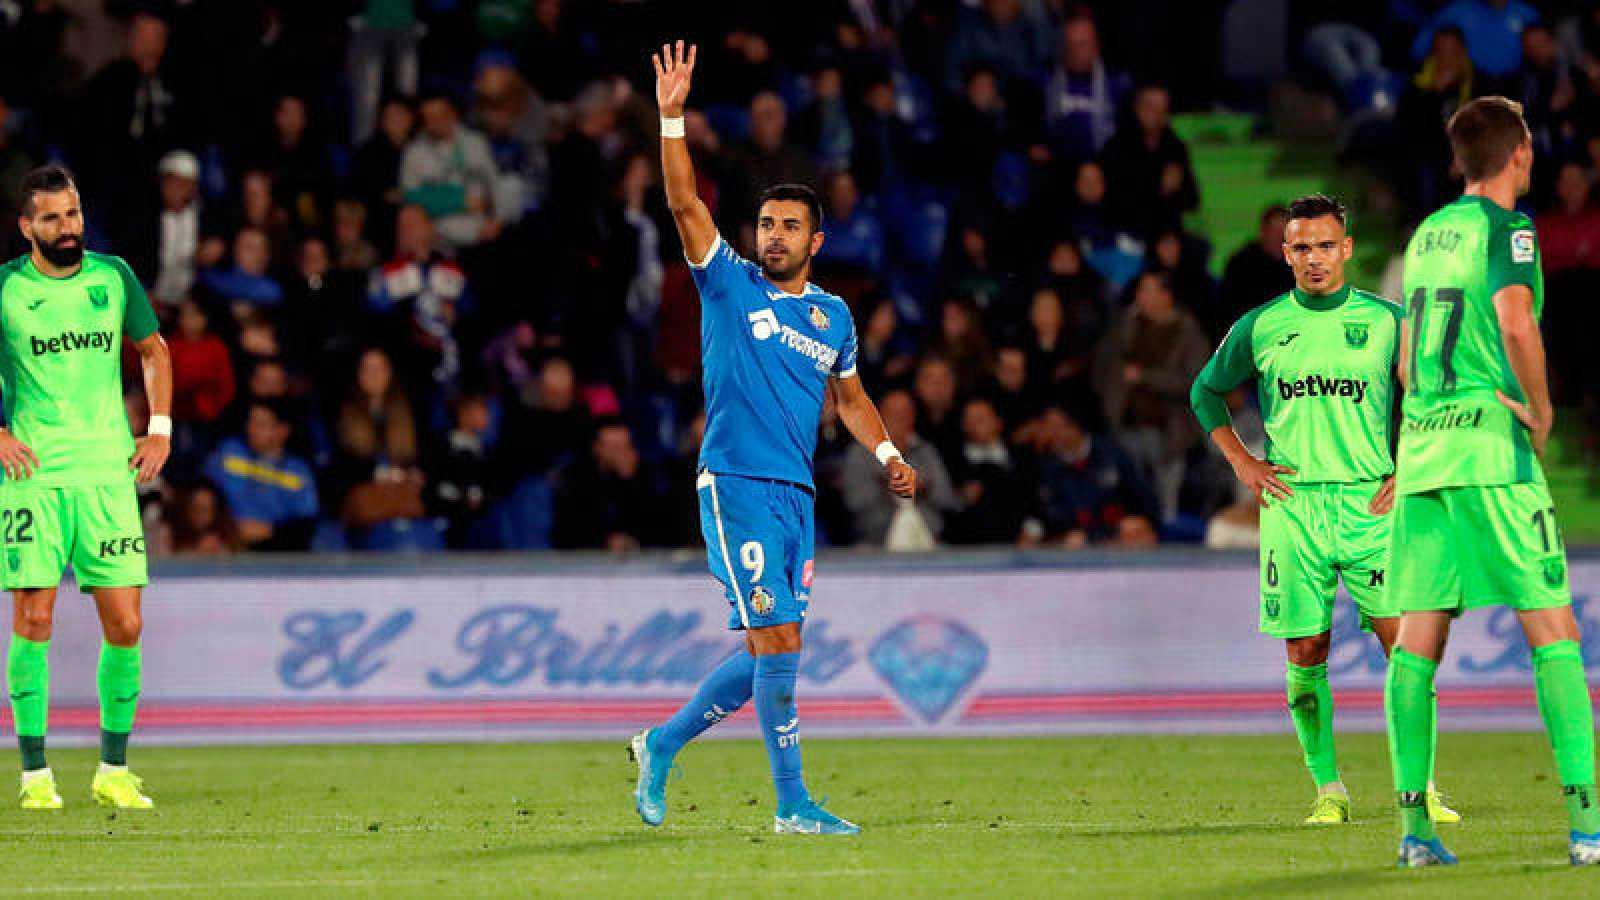 Ángel celebra uno de sus goles